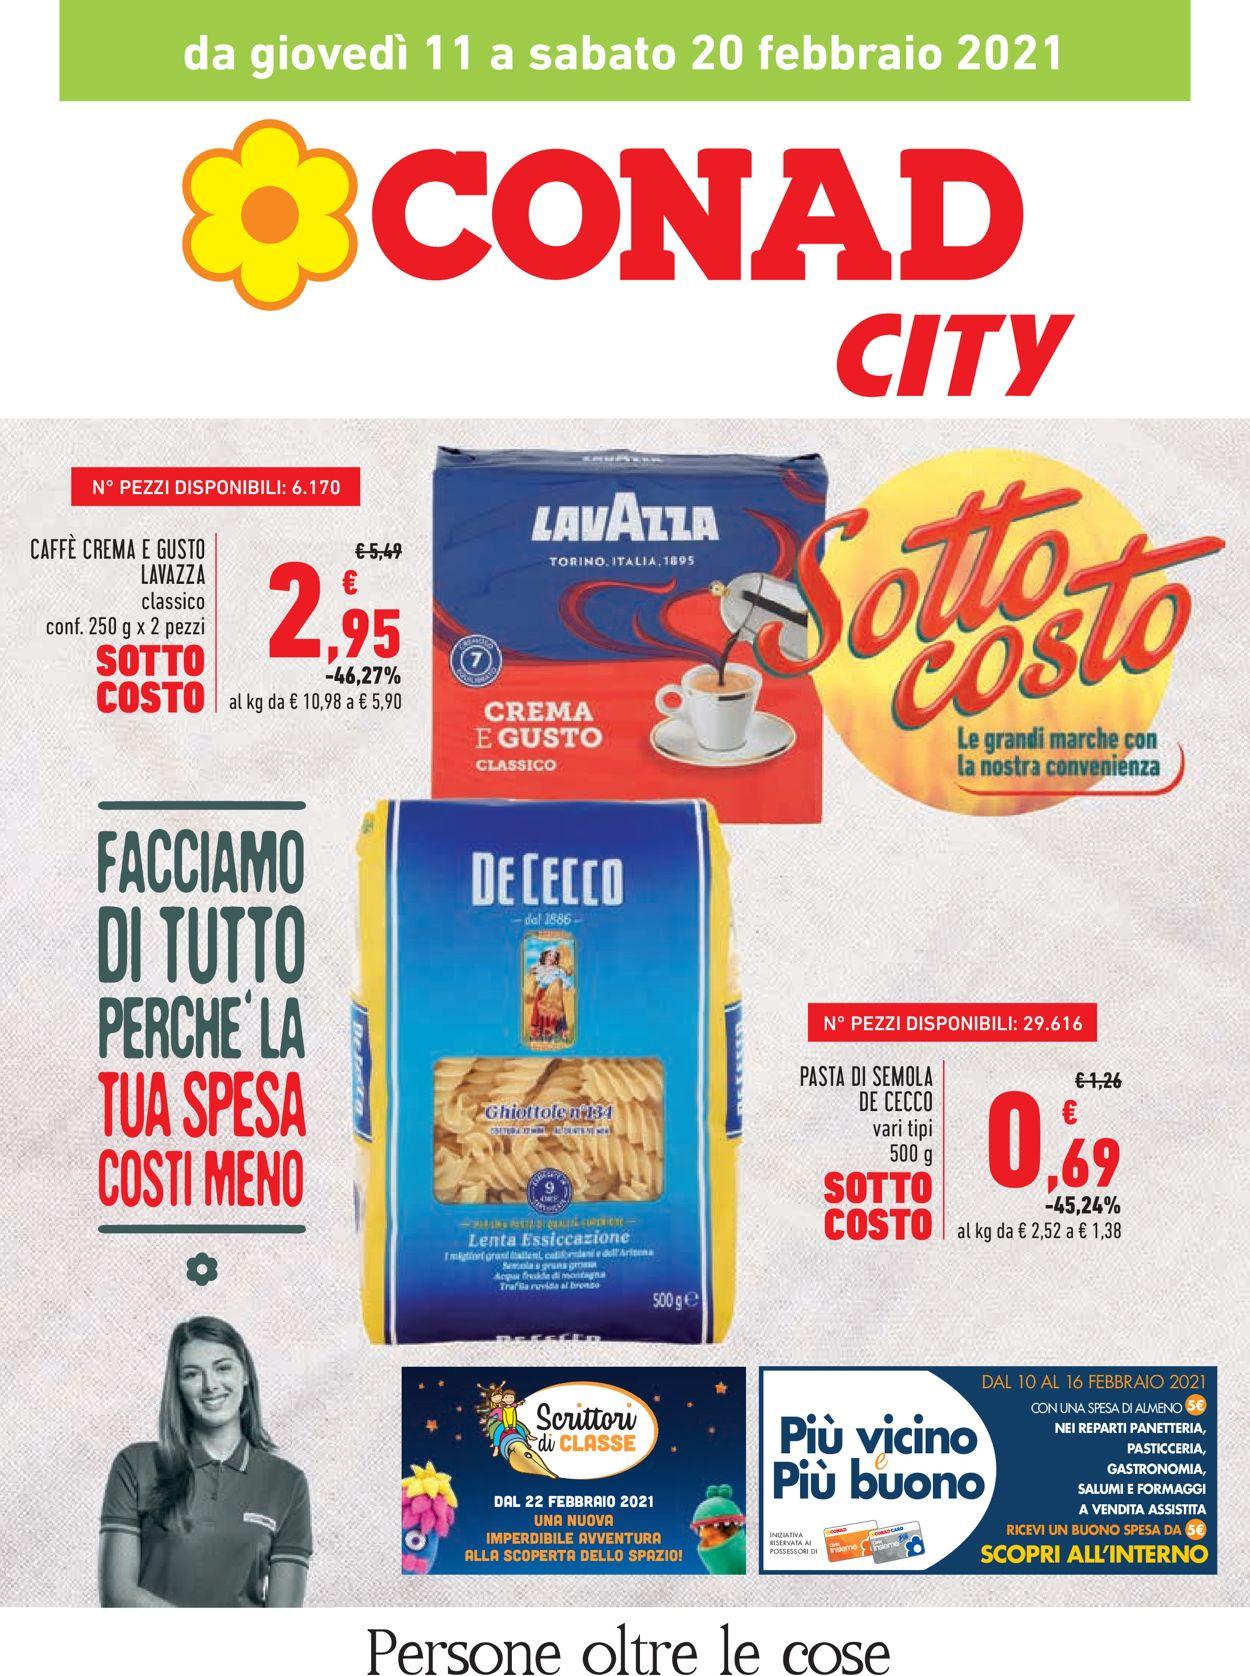 Volantino Conad City - Offerte 11/02-20/02/2021